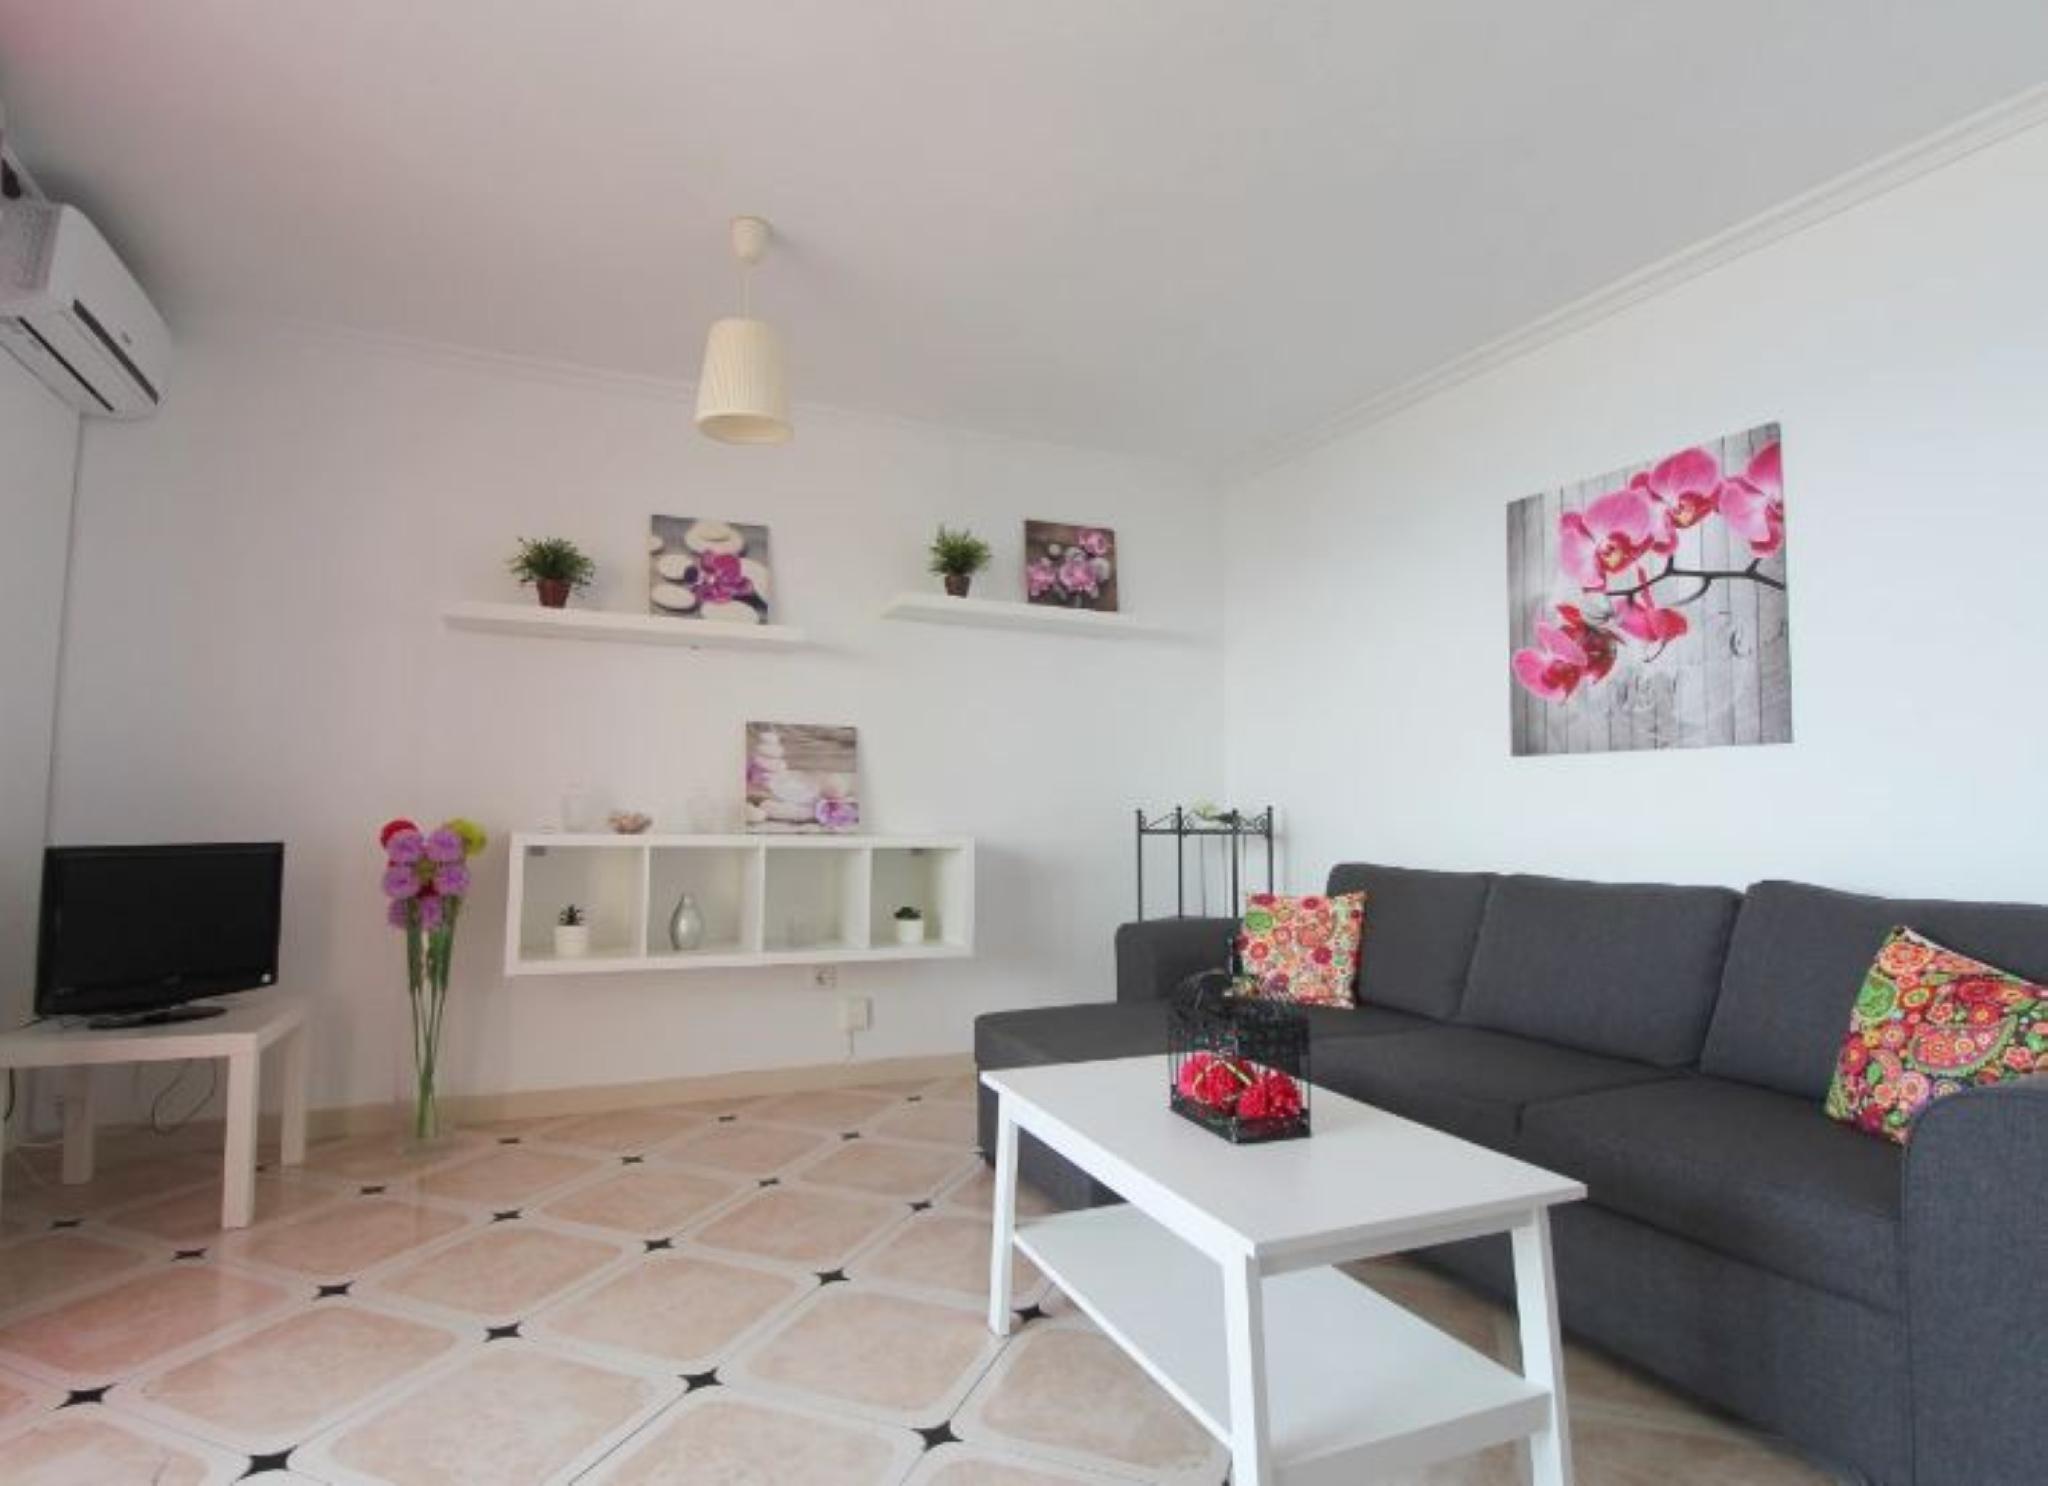 107847   Apartment In Rincn De La Vicoria